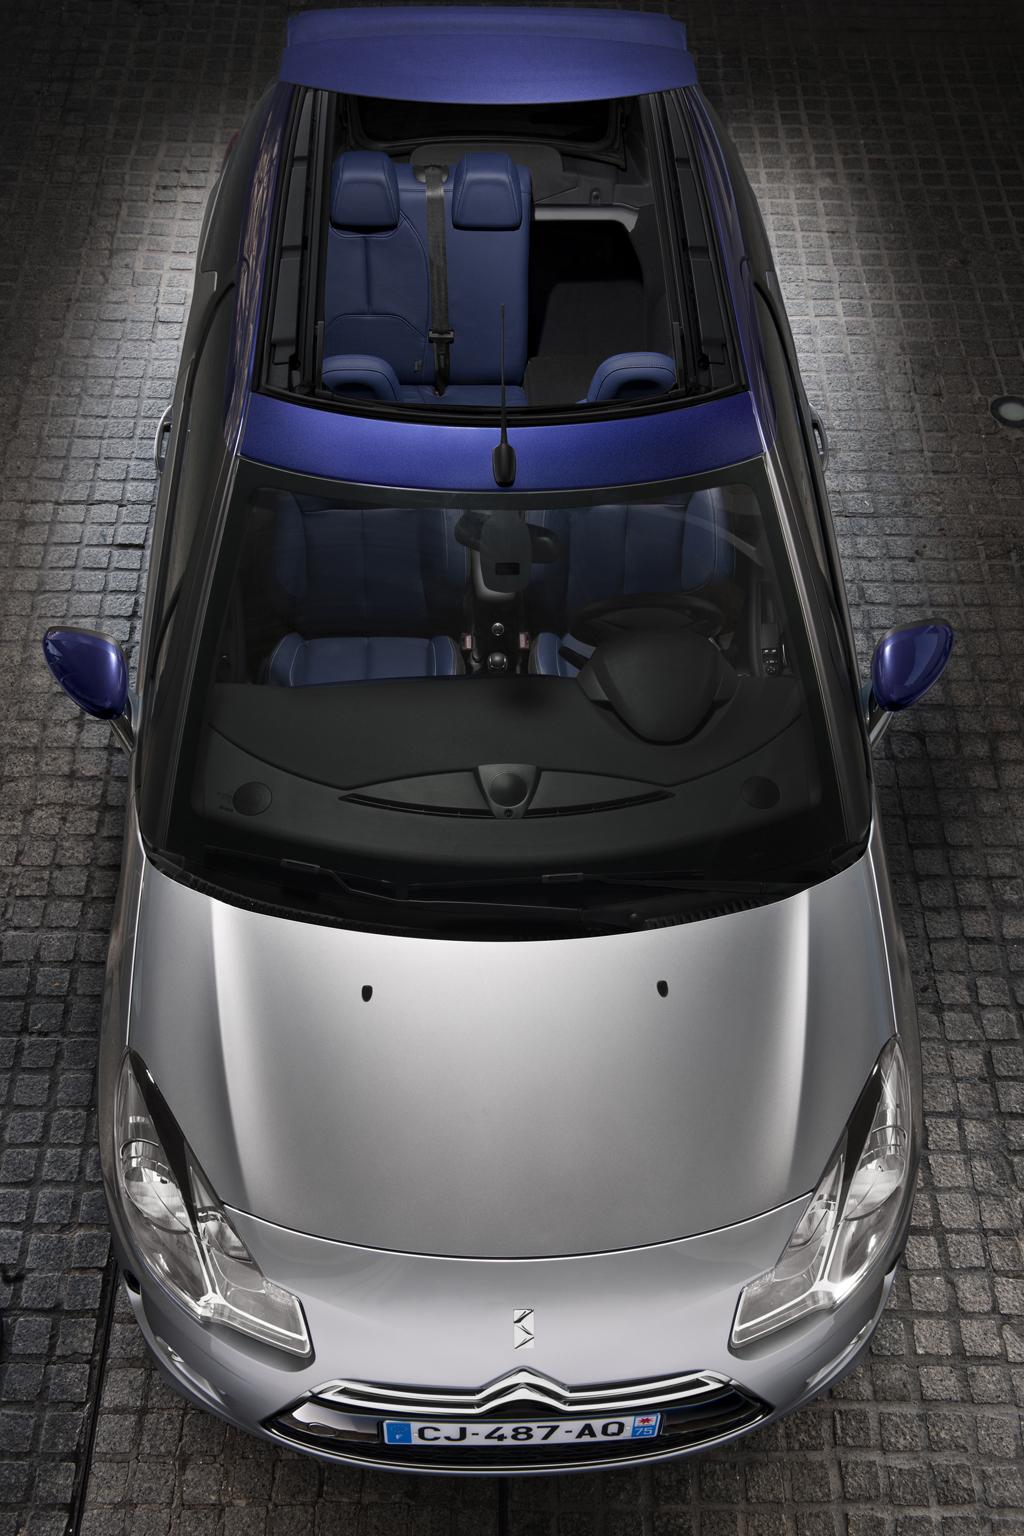 Automobily Citroën DS3 Cabrio 1.6 THP